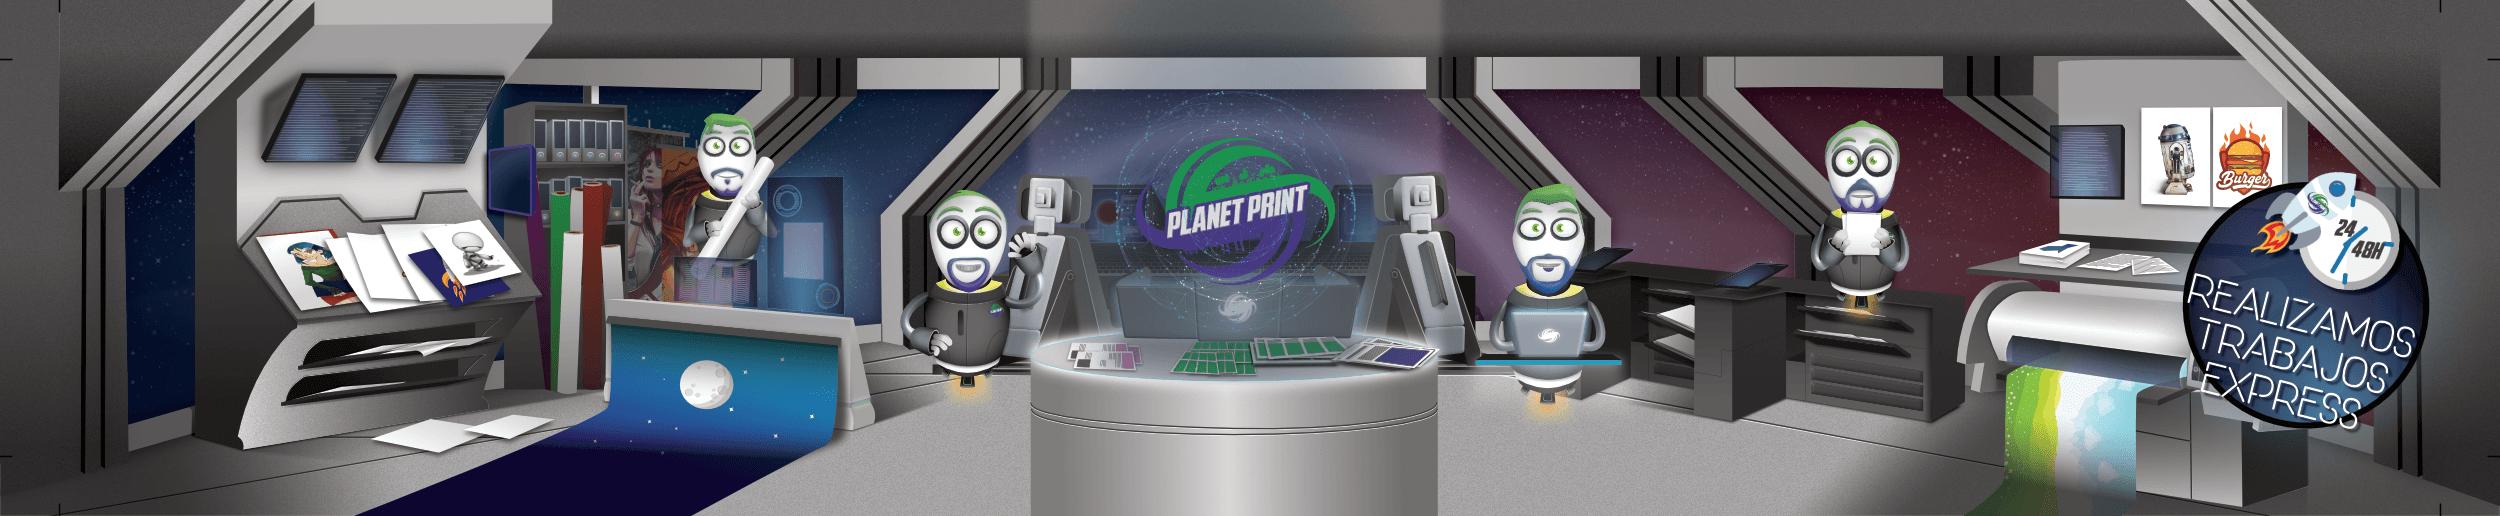 diseño nave planet print imprenta